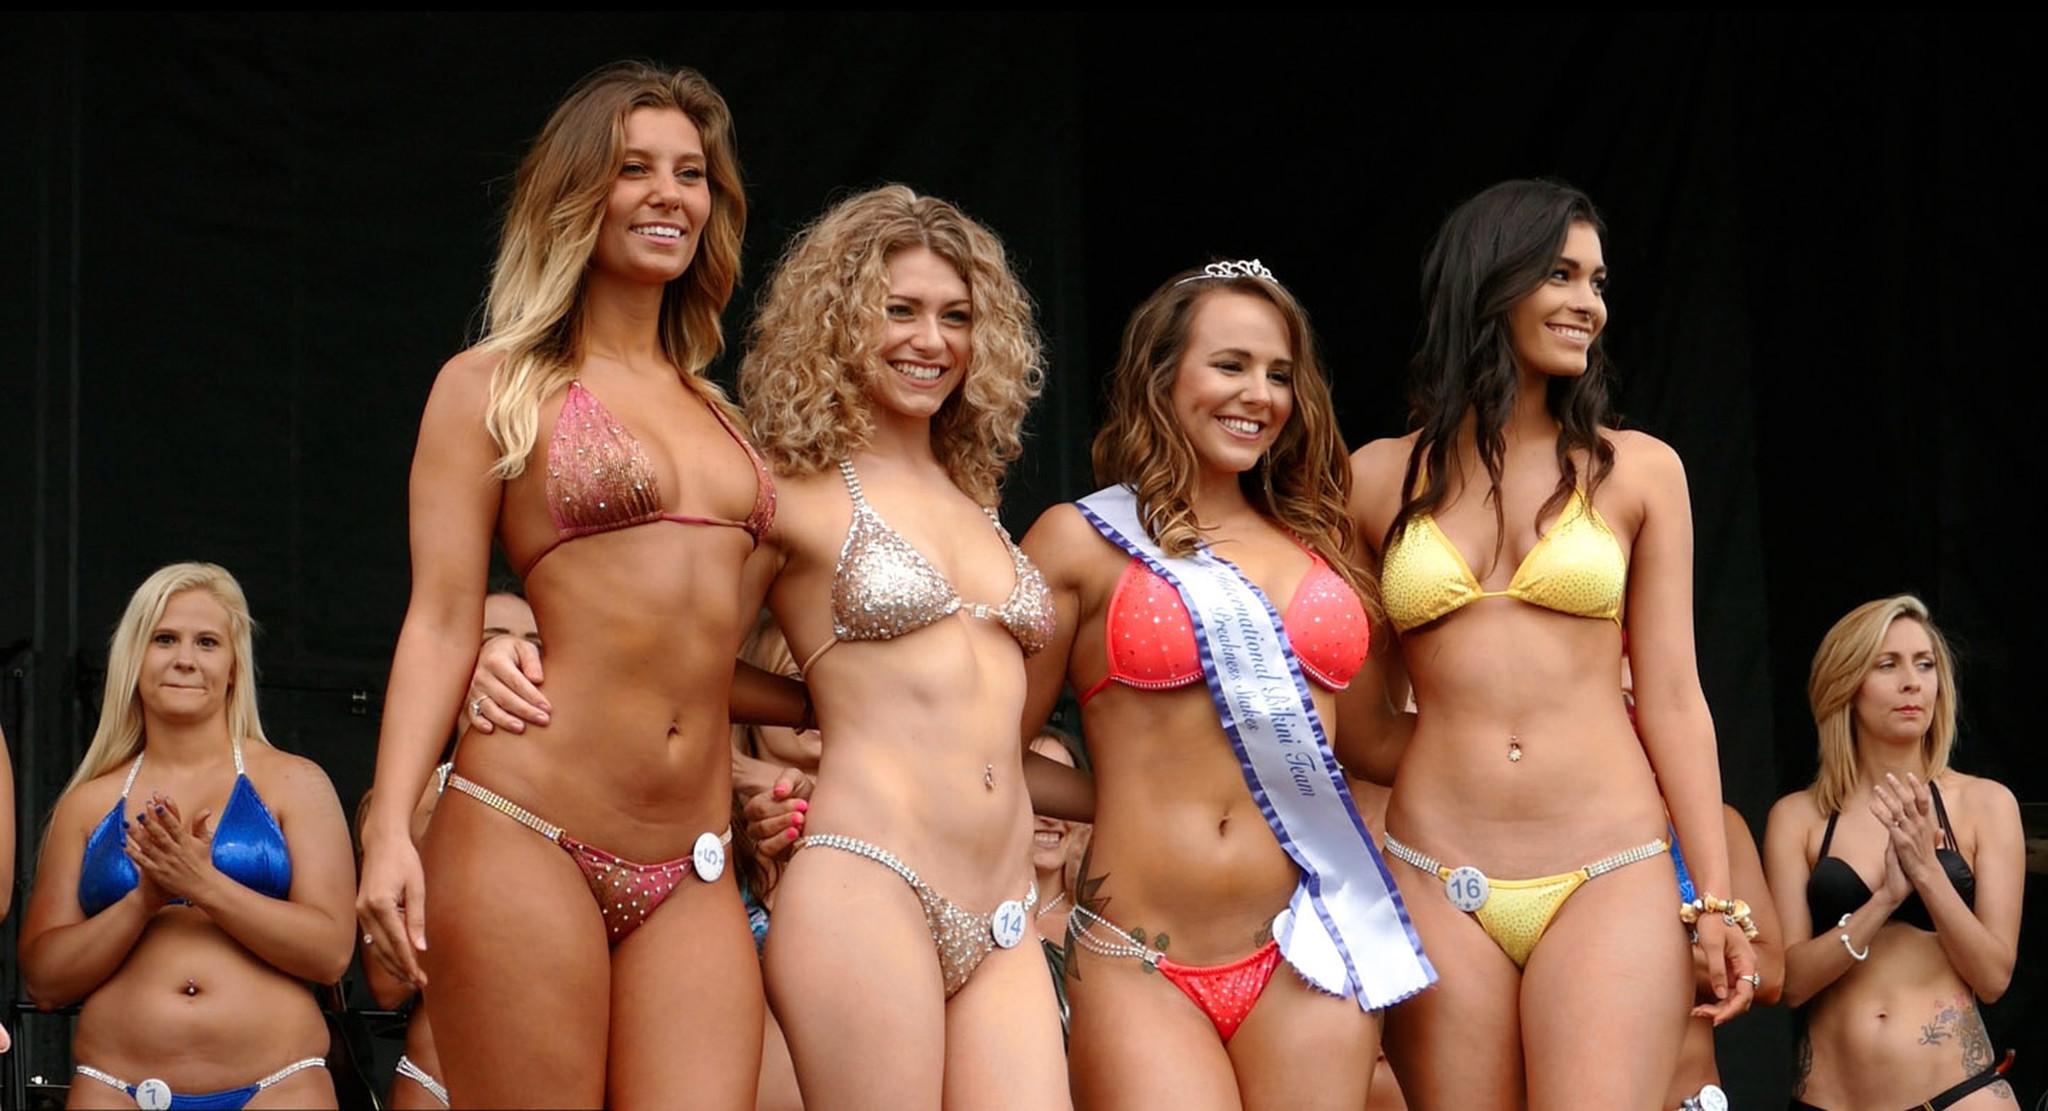 Bikini contest winners